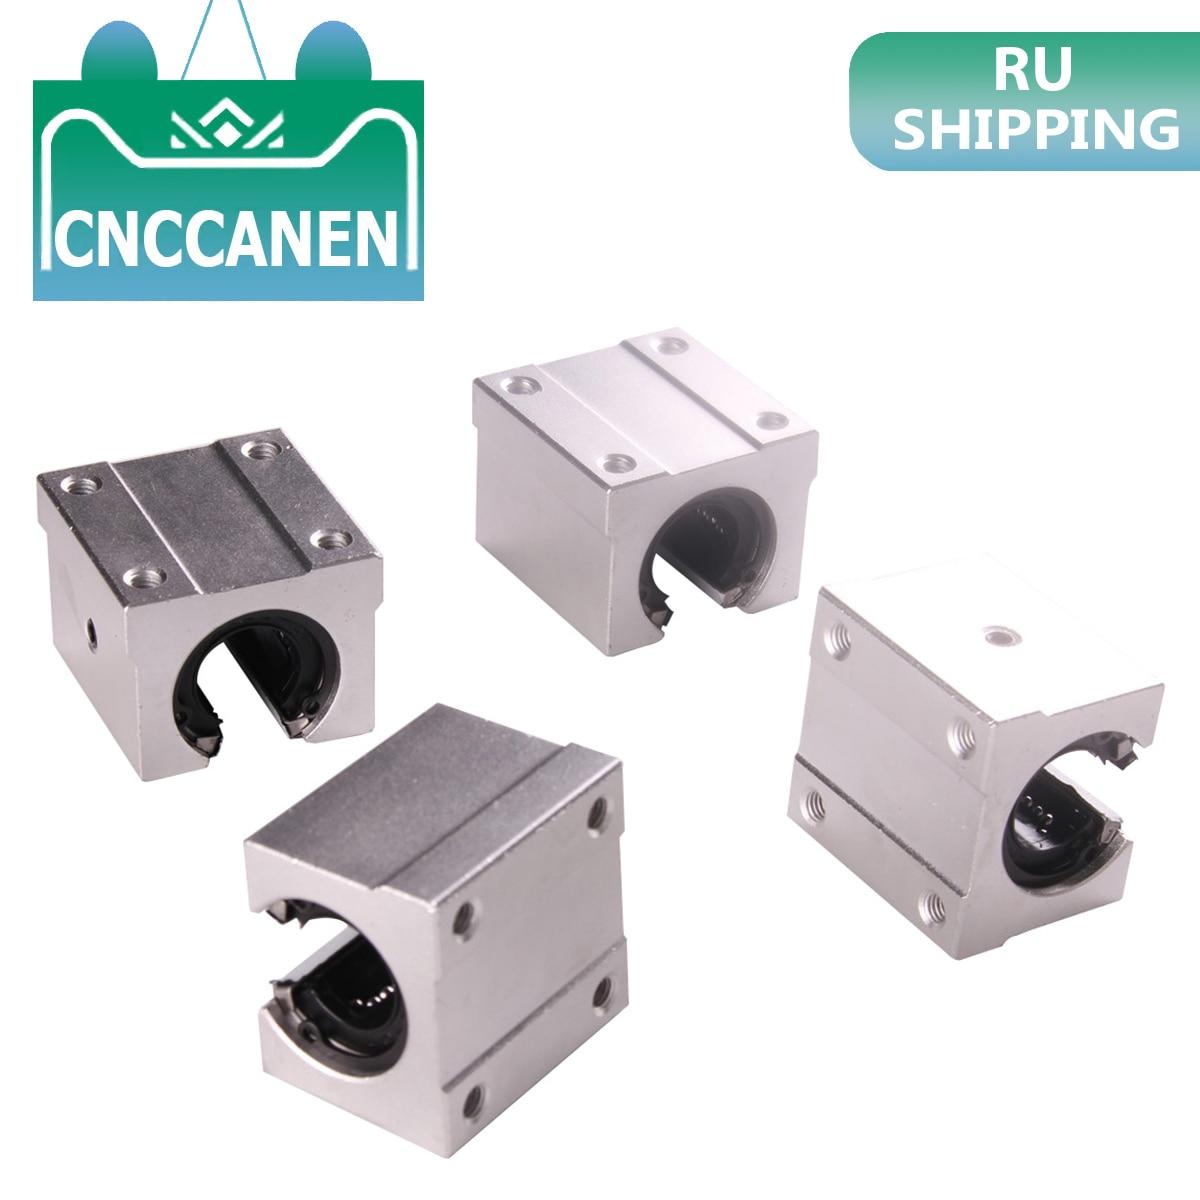 4pcs/Lot SBR12UU SBR16UU SBR20UU Aluminum Open Linear Motion Bearing Linear Ball Bearing Slide Block For Linear Rail CNC Part